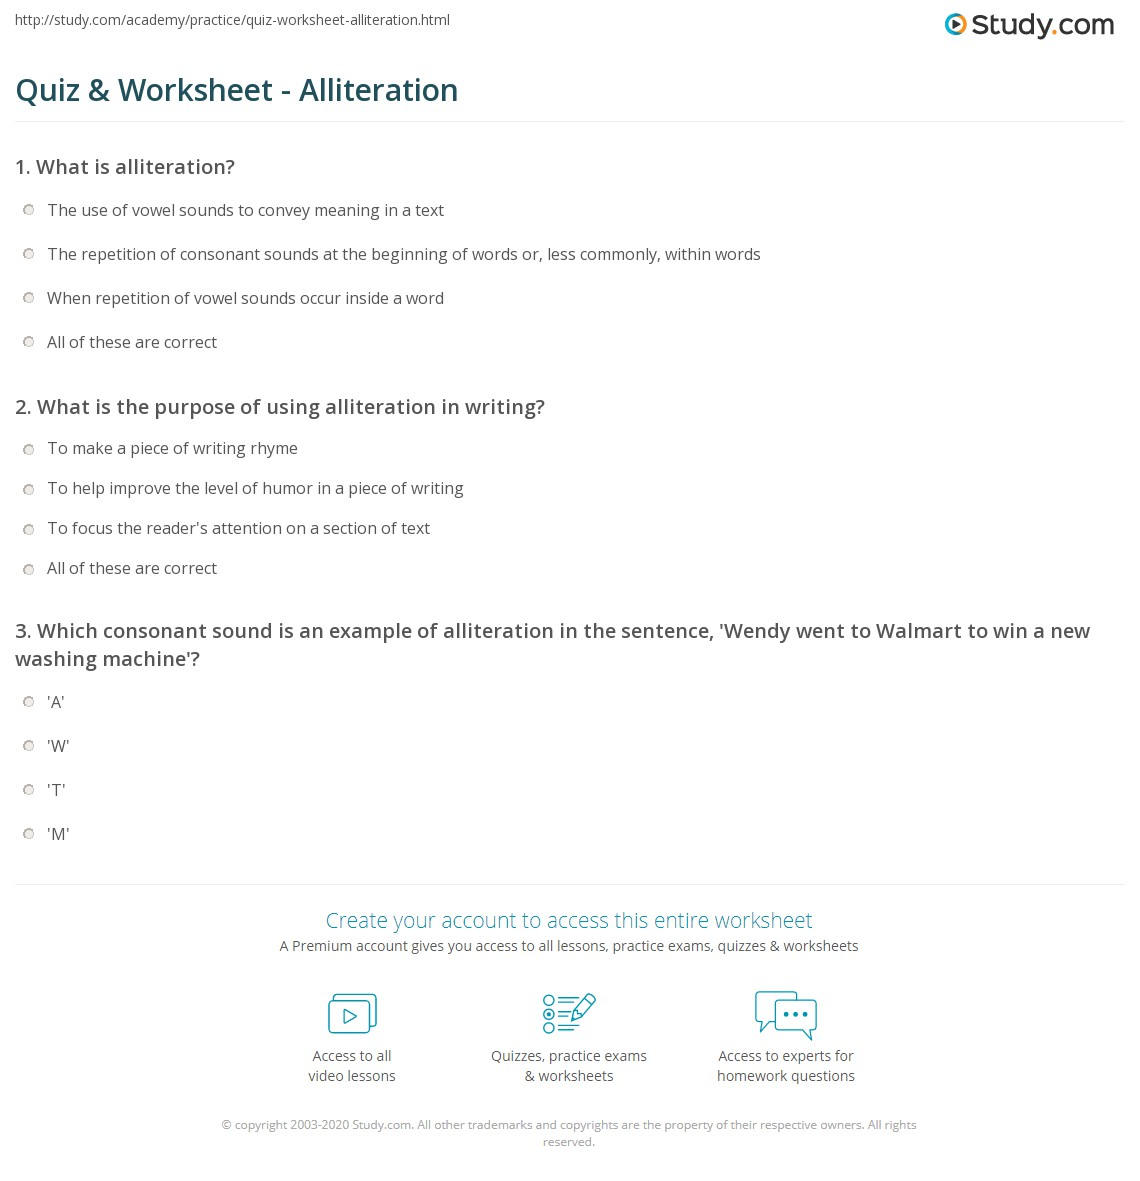 hight resolution of Quiz \u0026 Worksheet - Alliteration   Study.com